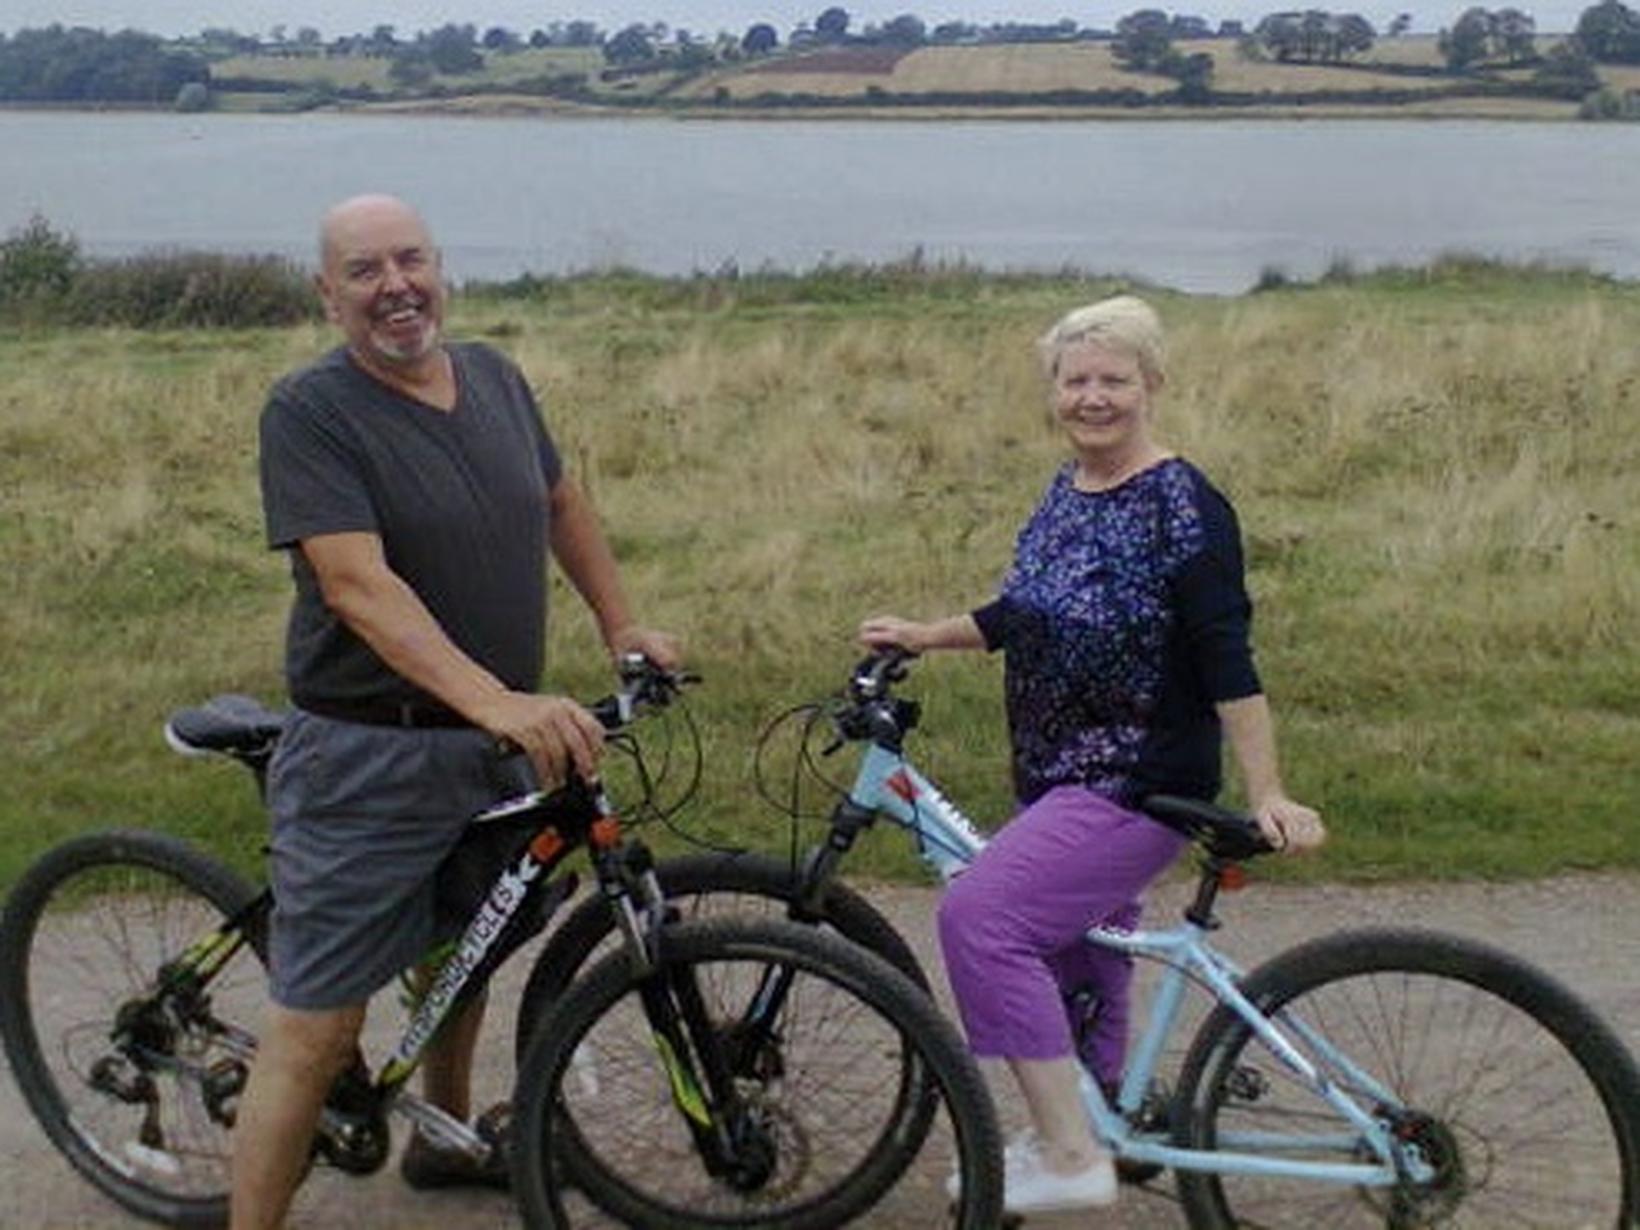 June & Richard from Northampton, United Kingdom